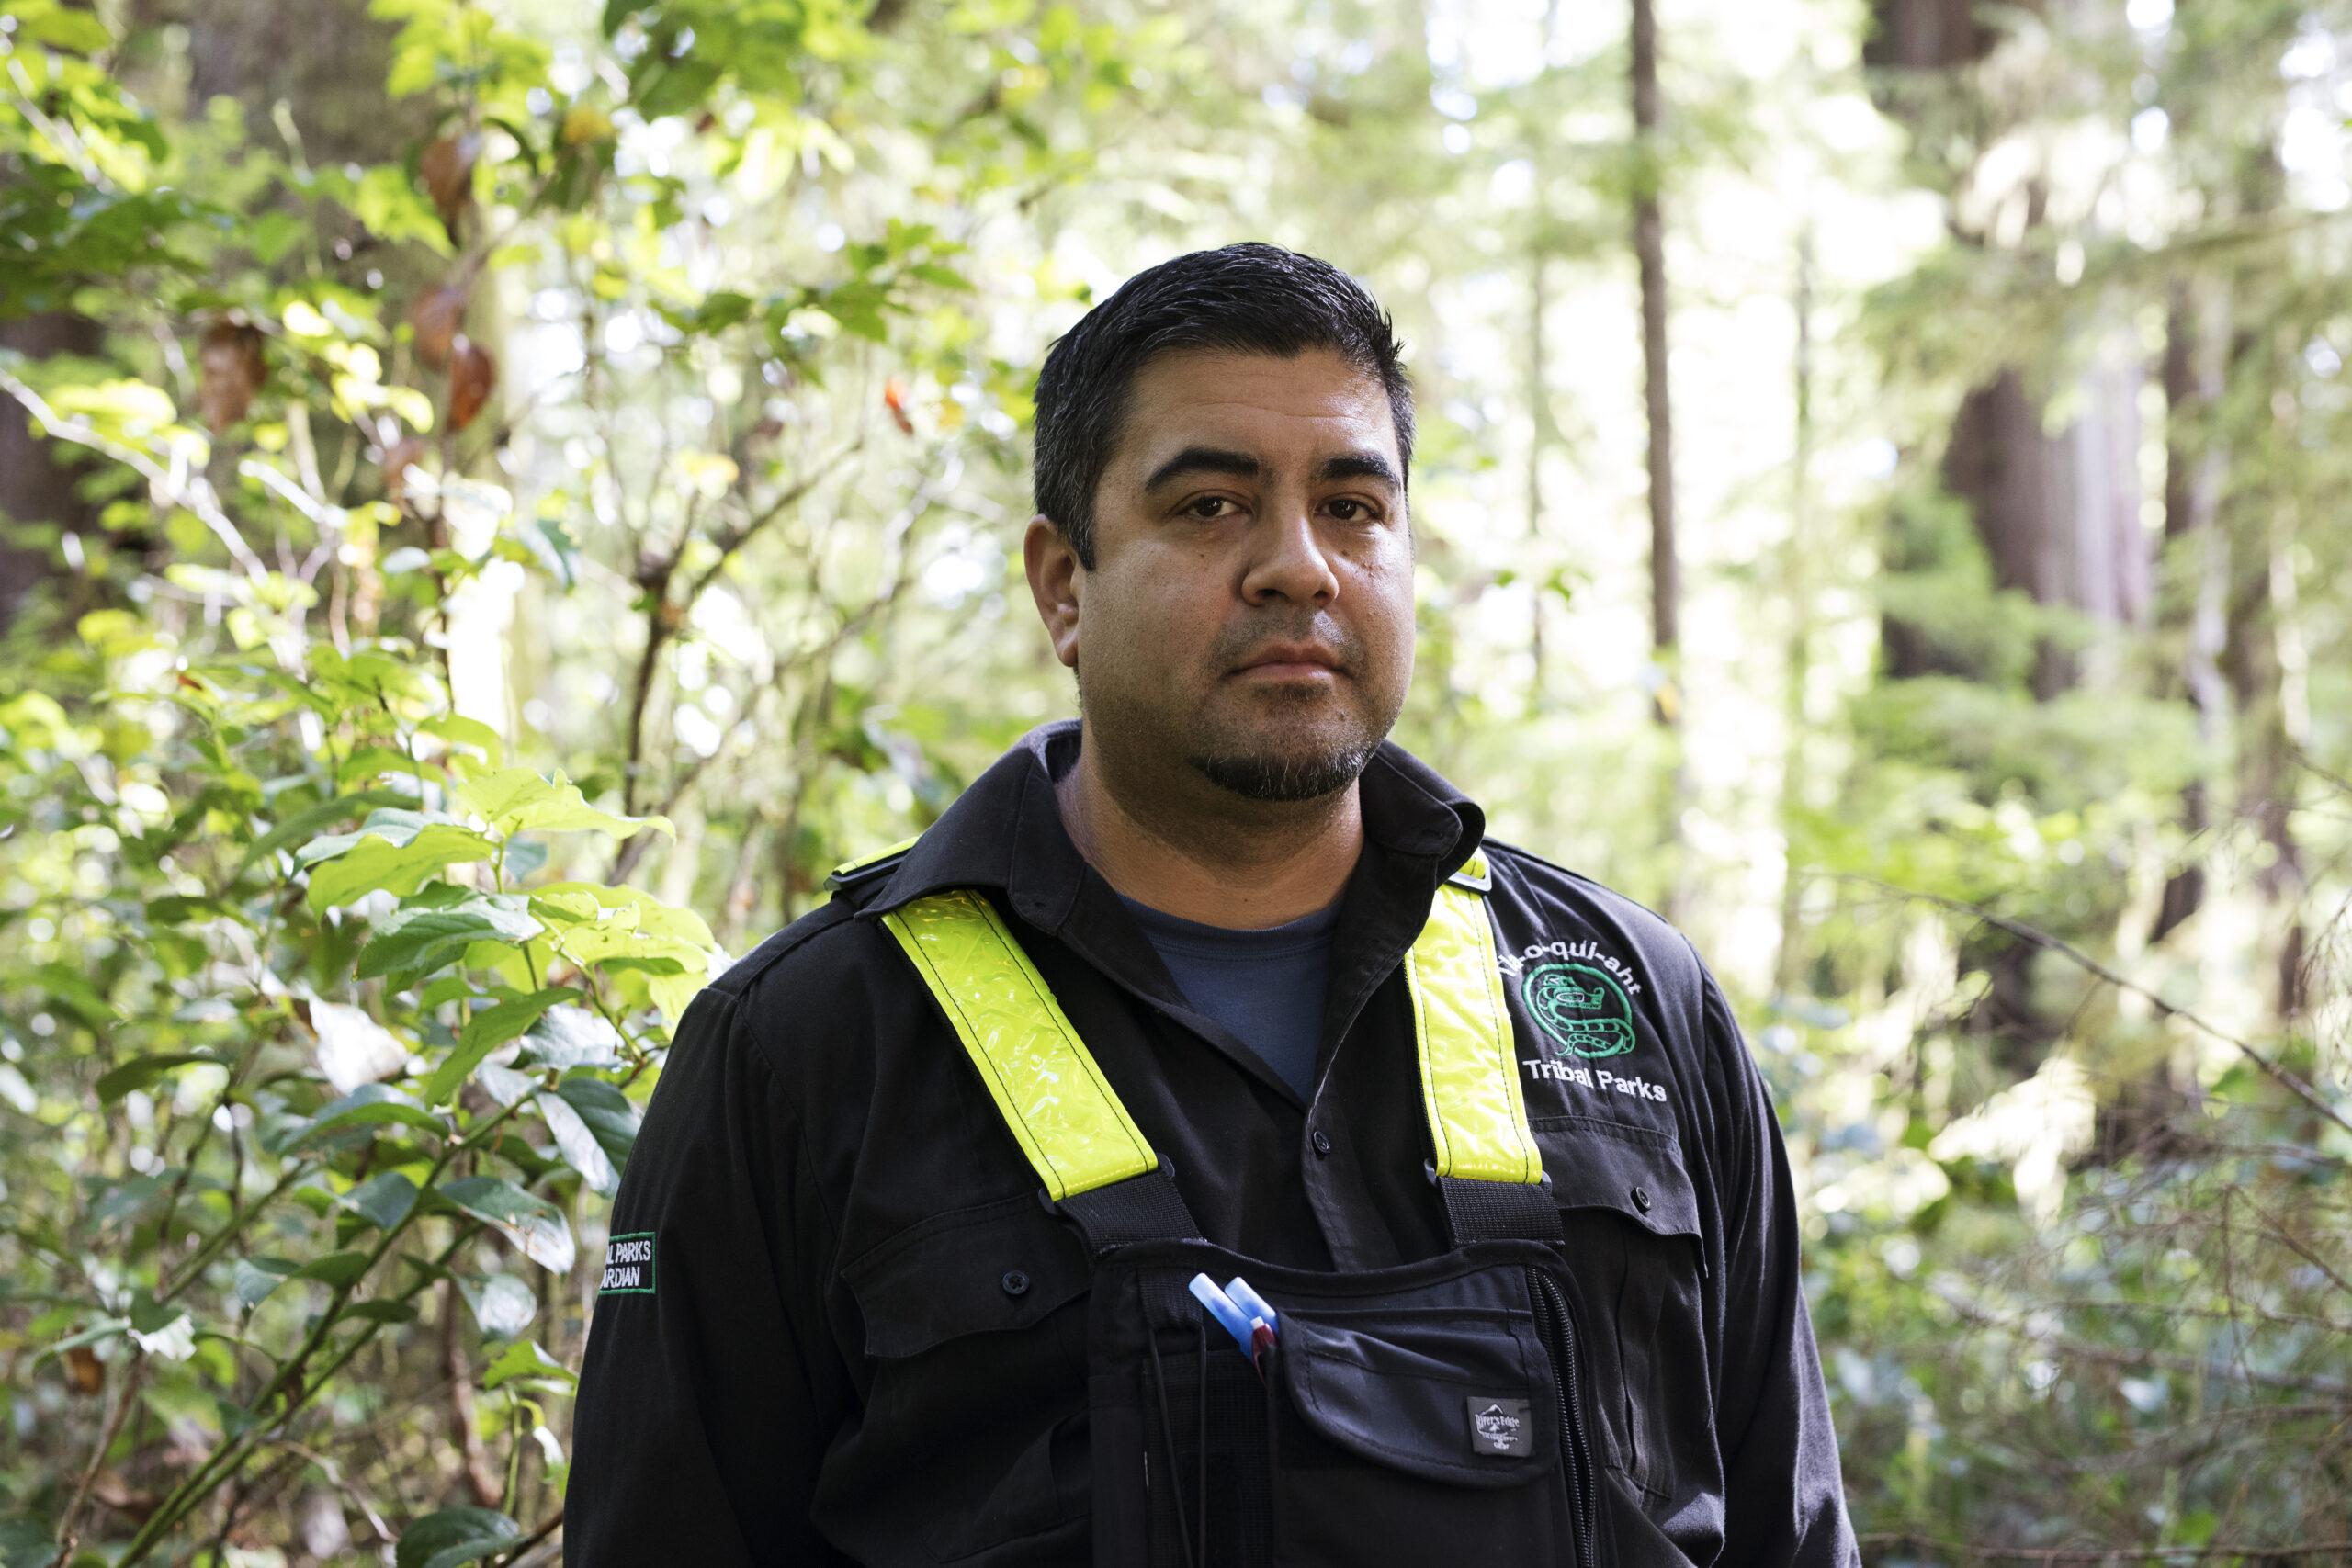 Joe Louie-Elley poses for a portrait along the Big Tree Trail